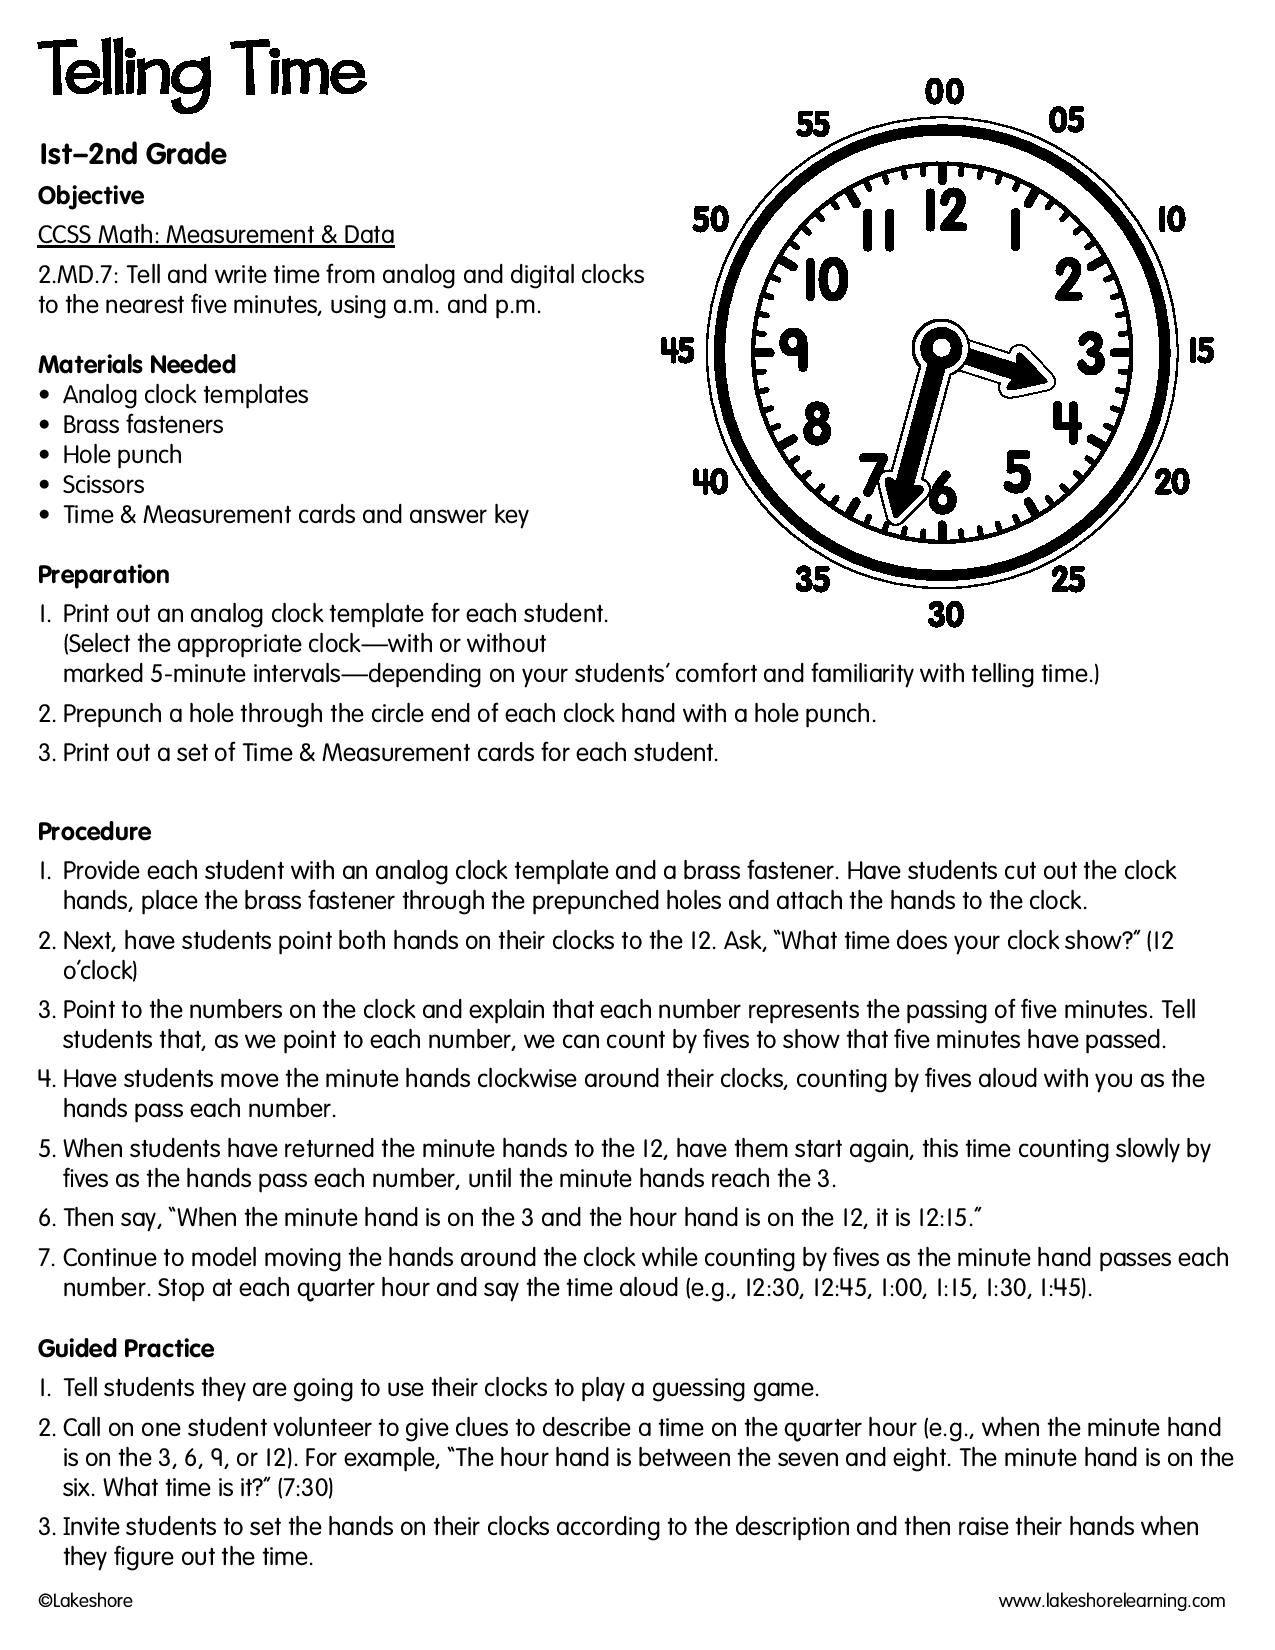 Telling Time #lessonplan   Lesson Plans   Lesson plans, Free